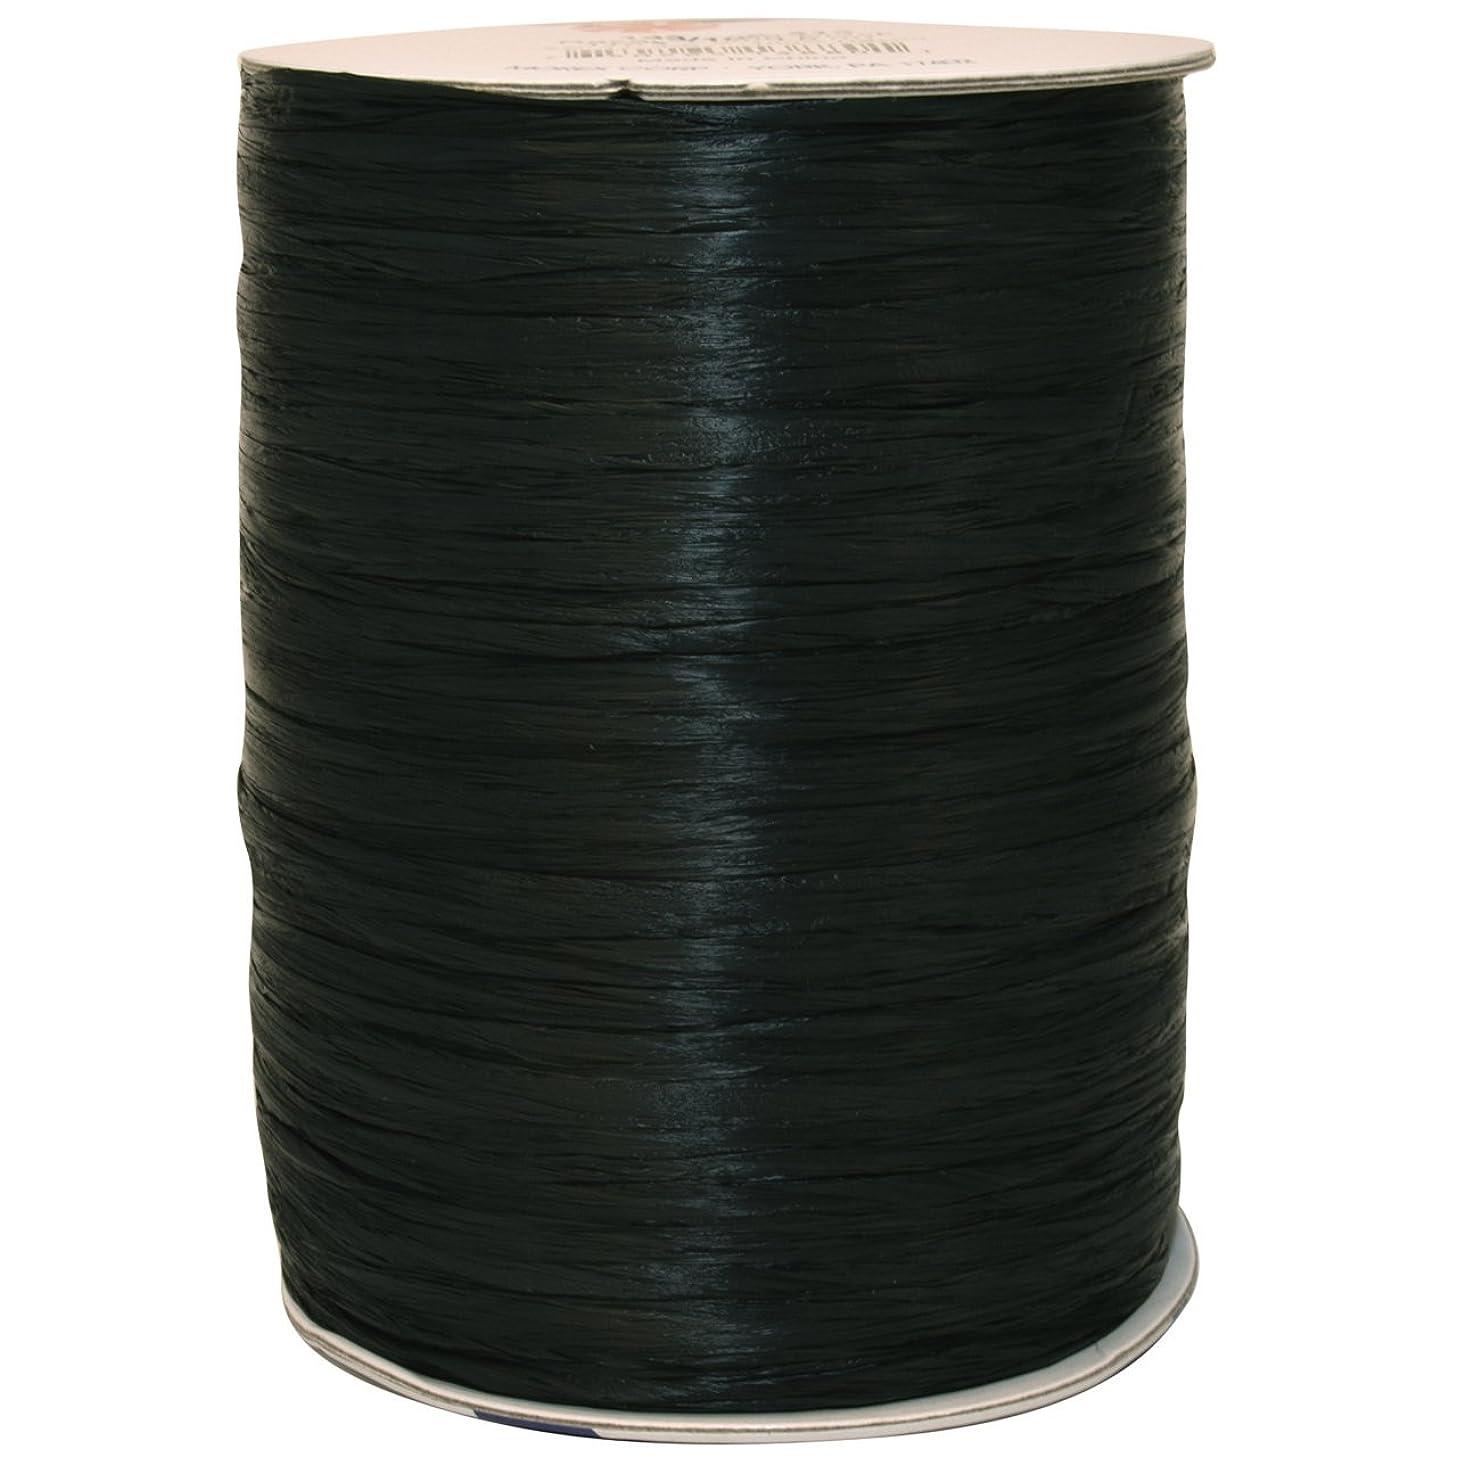 Morex Ribbon Rayon Raffia Fabric Spool, 100 yd., Black